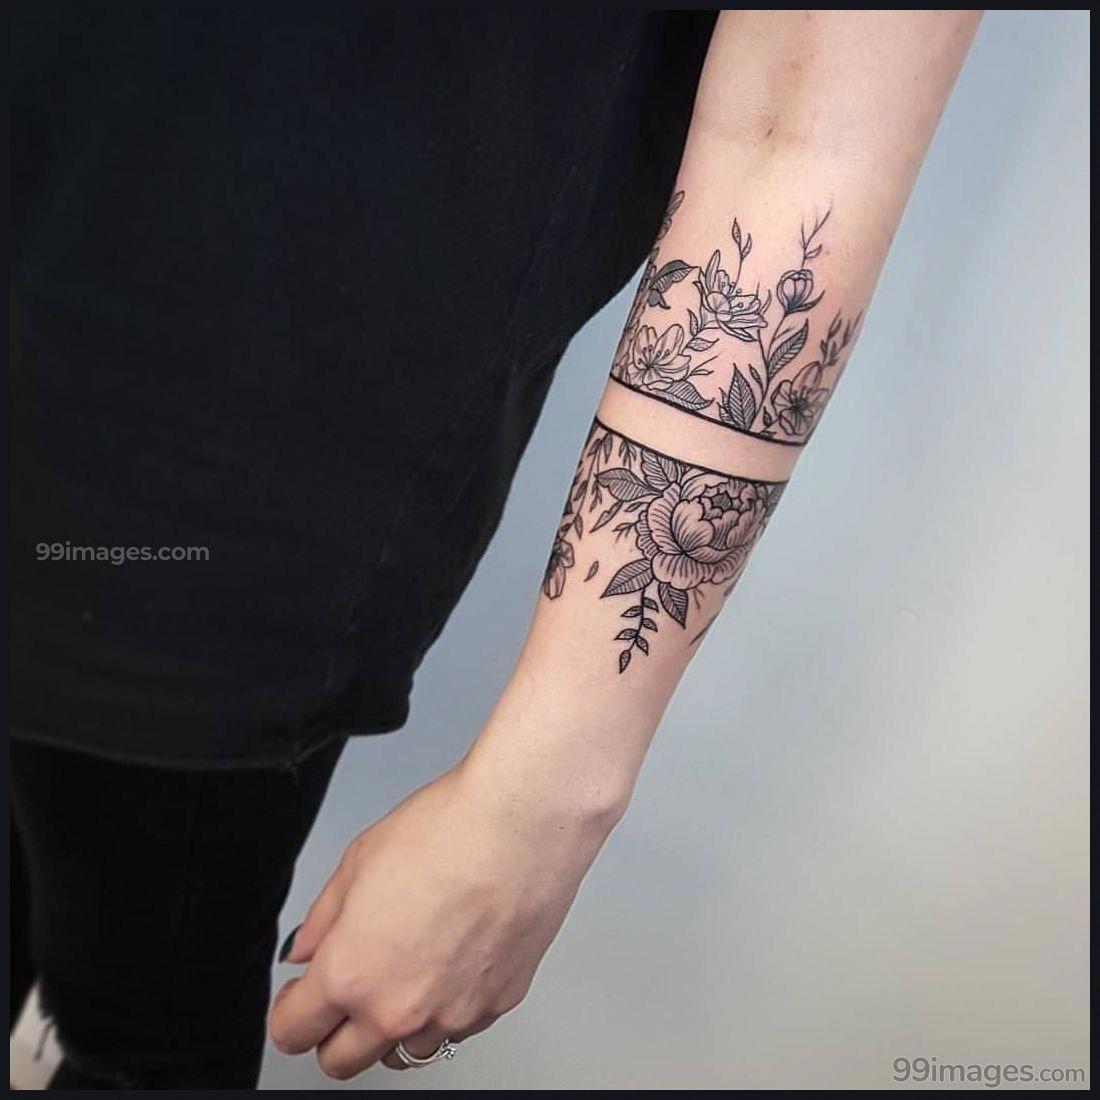 ada6ccddd Top Forearm Tattoos For Men (HD Photos) - #15138 #forearmtattoosformen # tattoo #topmenstattoos